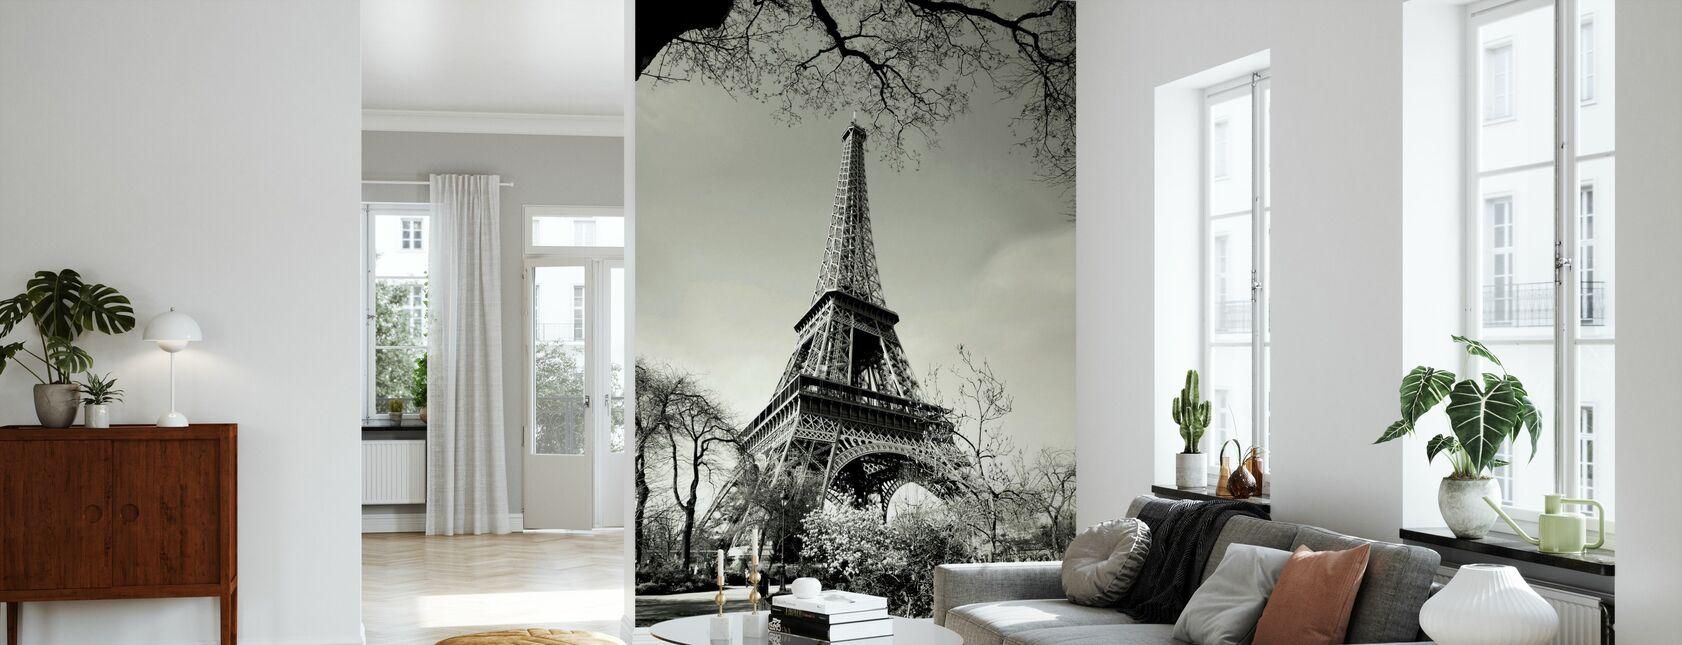 Eiffel Tower - Wallpaper - Living Room